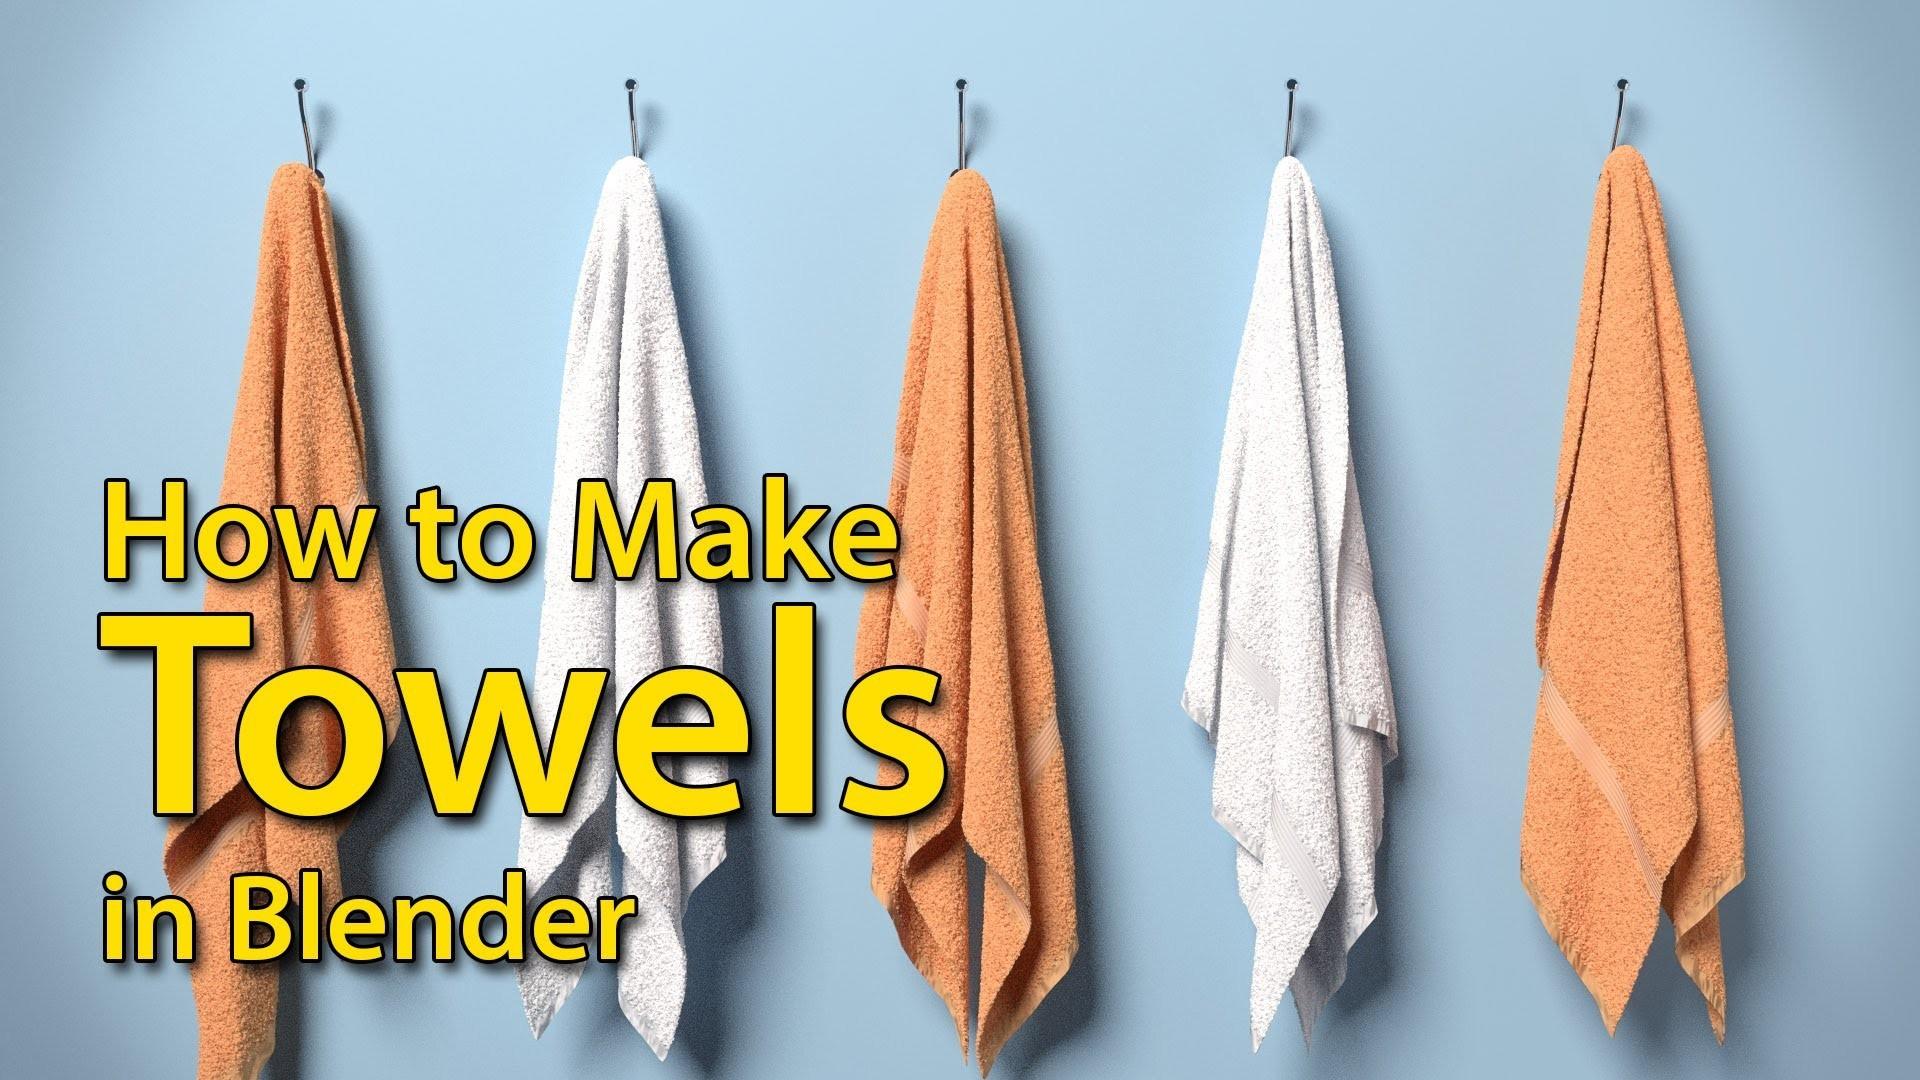 How to Make Towels - Blender Tutorial